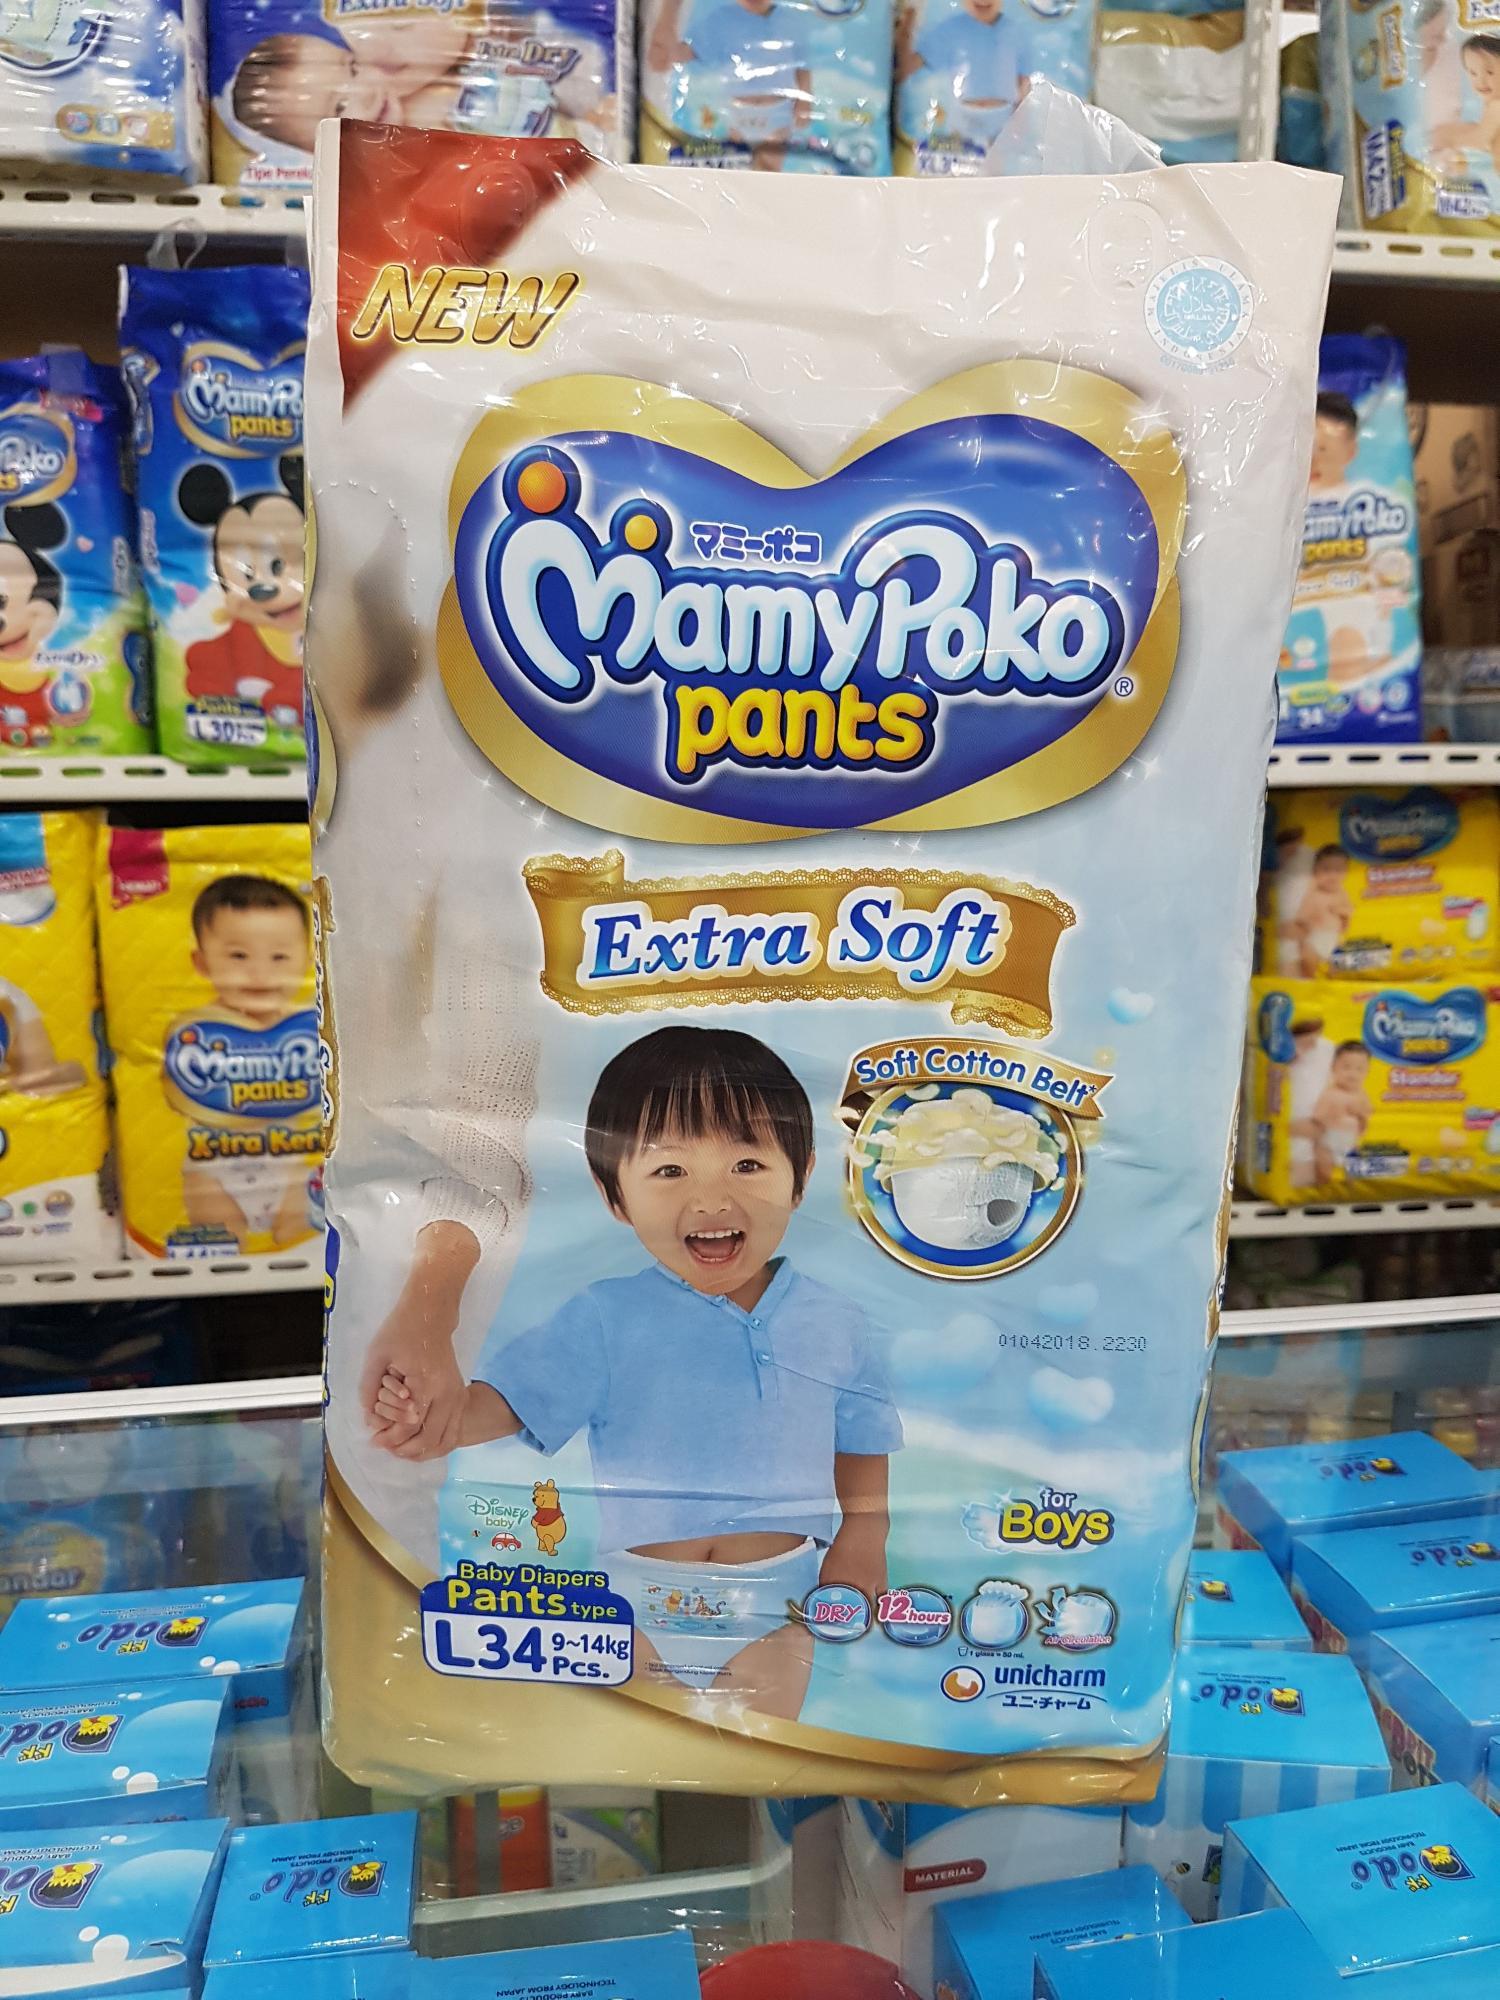 Kelebihan Mamy Poko Np801 Mamypoko Pants Extrasoft Boys L28 Extra Soft Xl 30 Girls L34 Boy